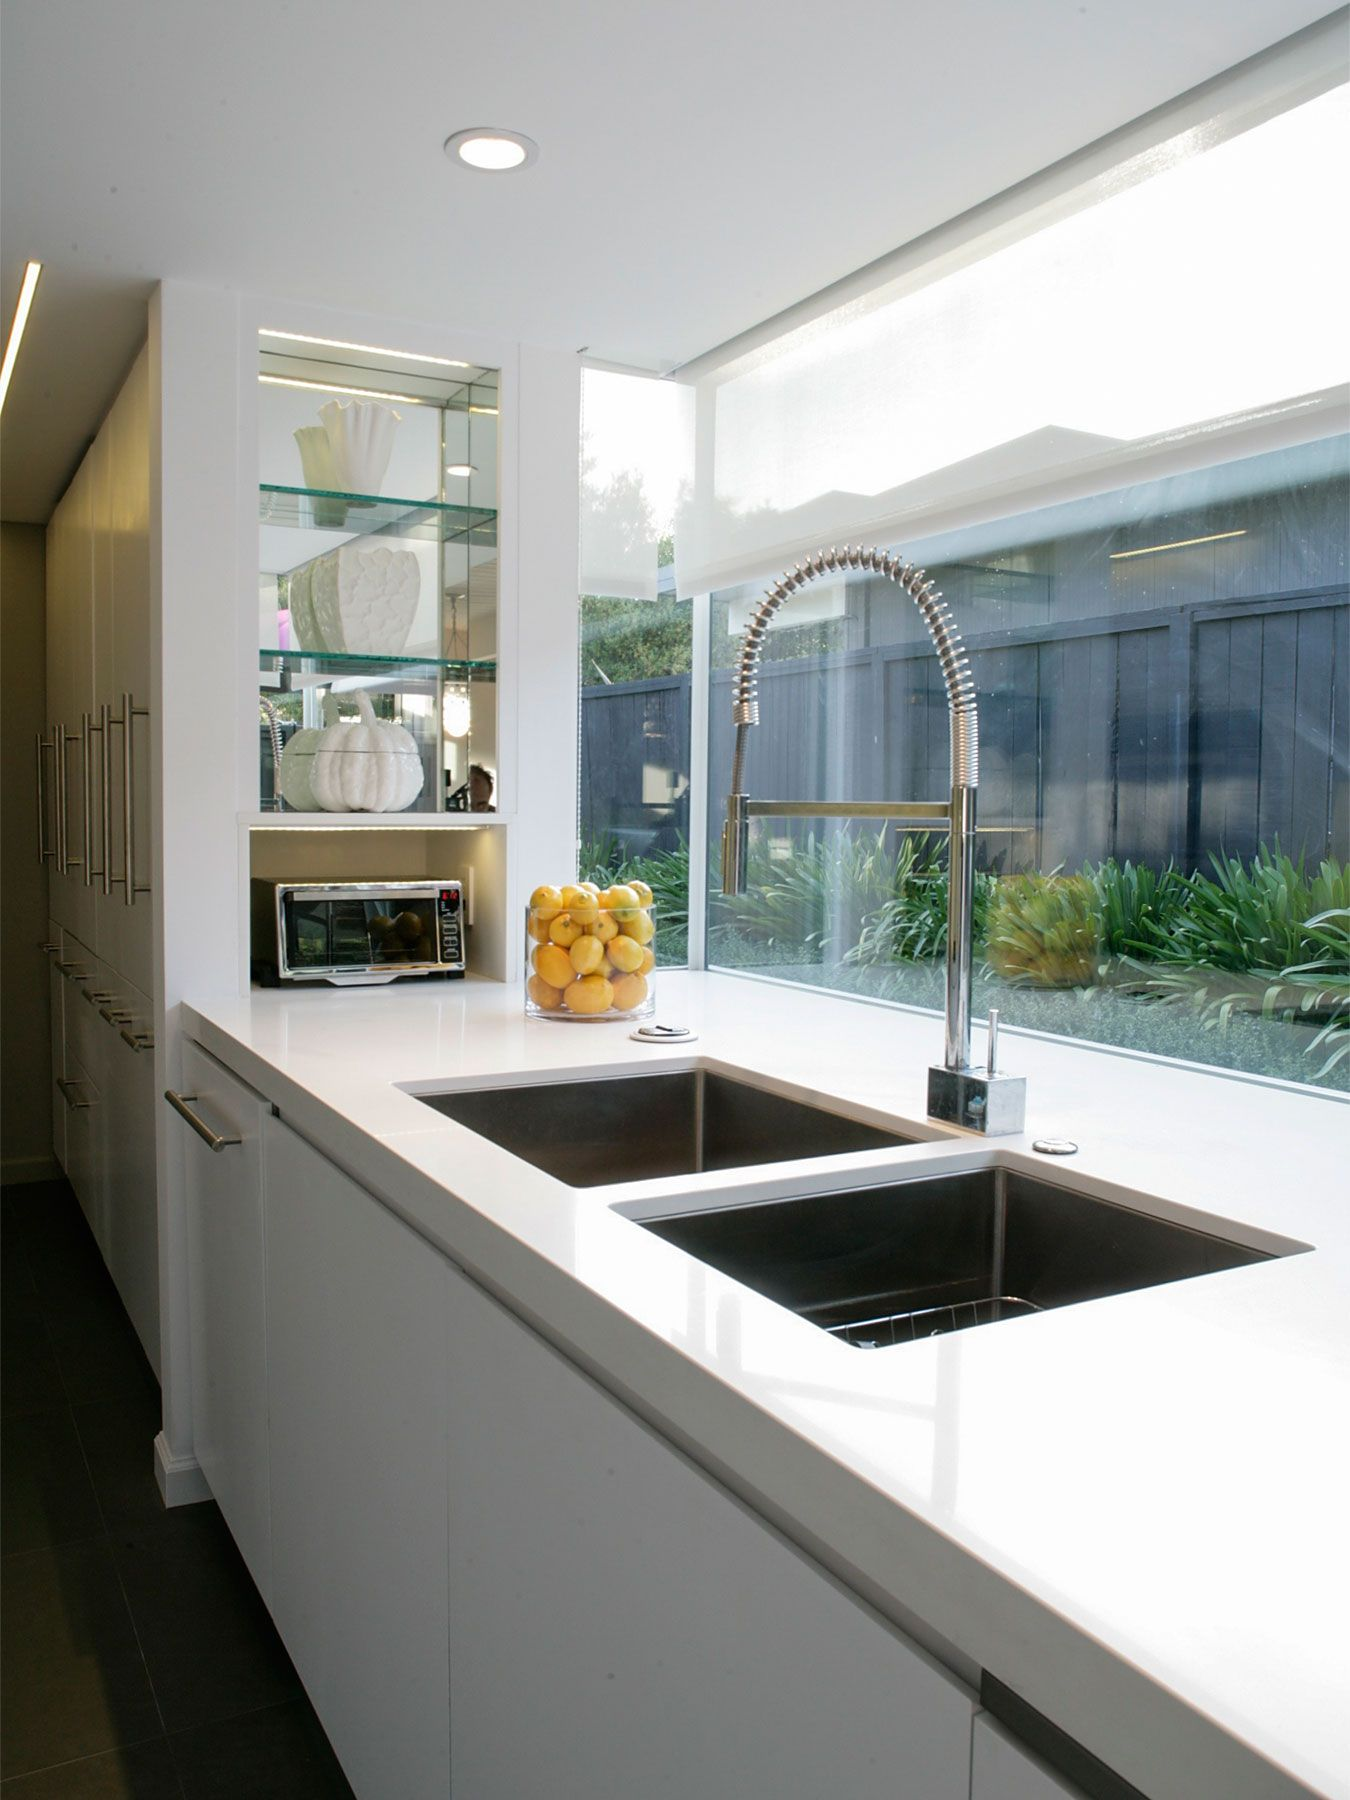 Pin By Jann Hanser On Kitchen Ideas